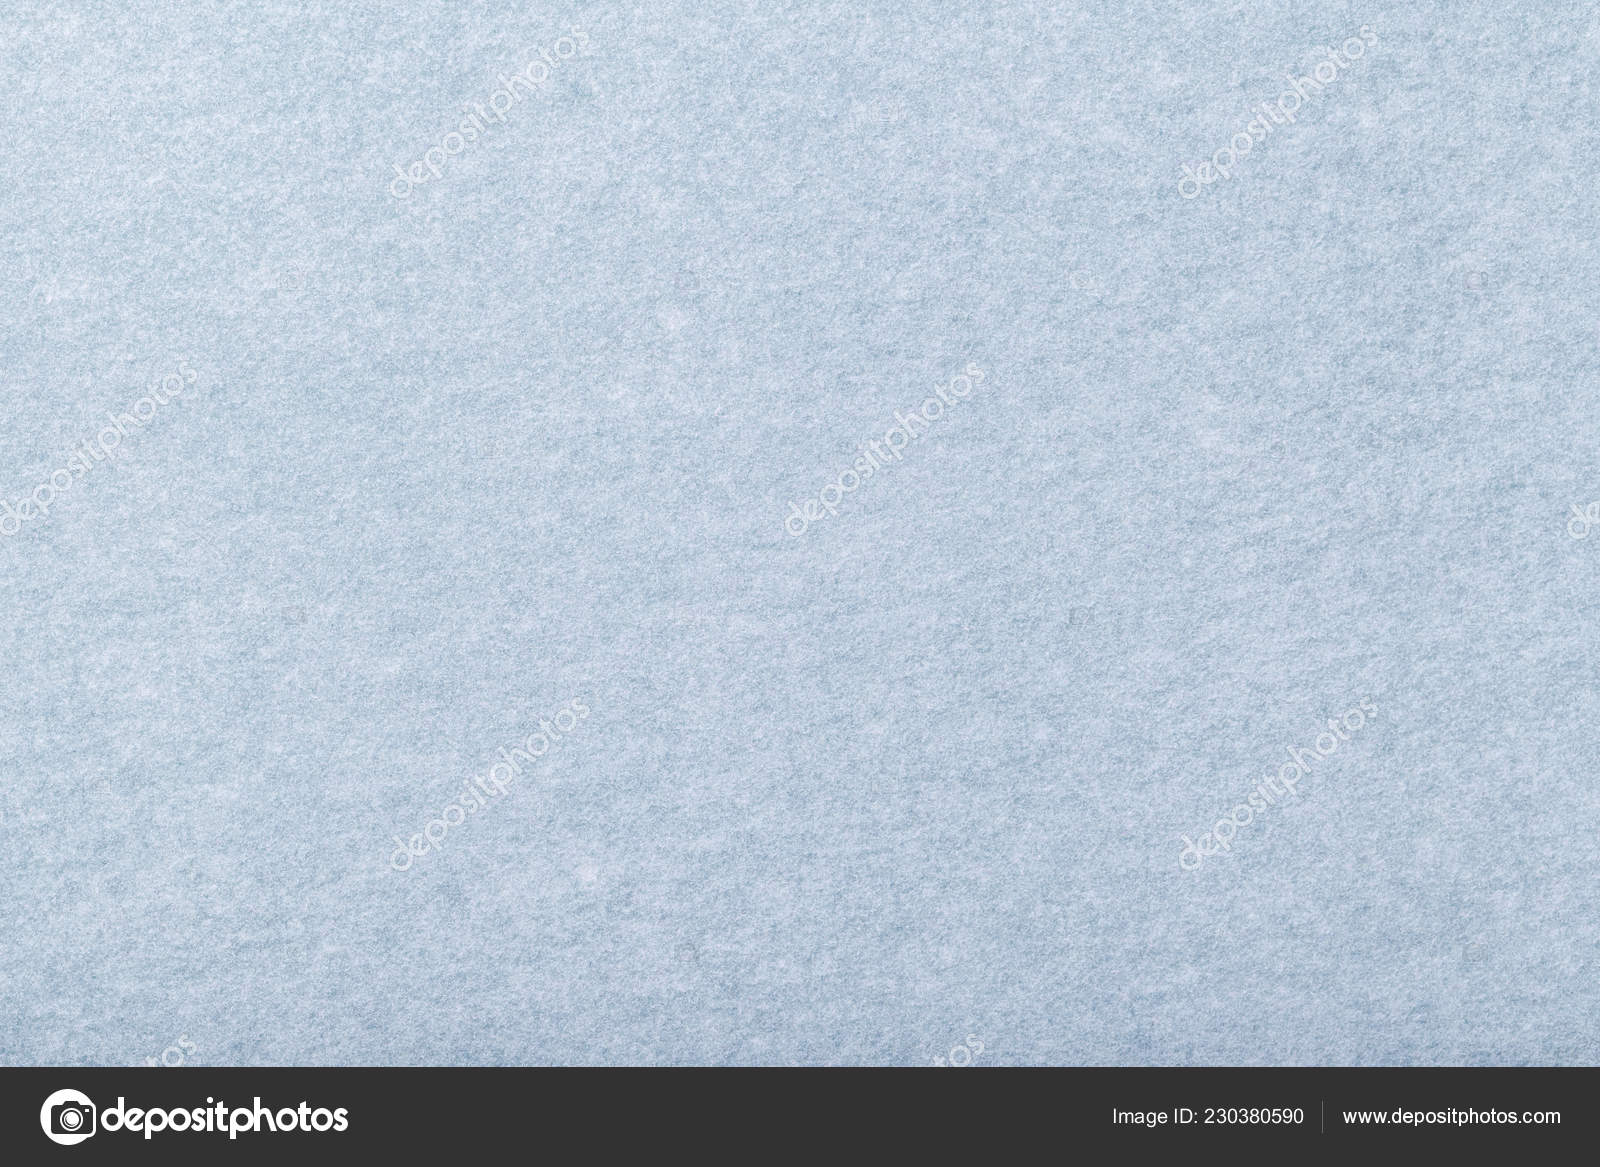 Light Blue Matte Background Suede Fabric Closeup Velvet Texture Seamless Stock Photo Image By C Nikol85 230380590